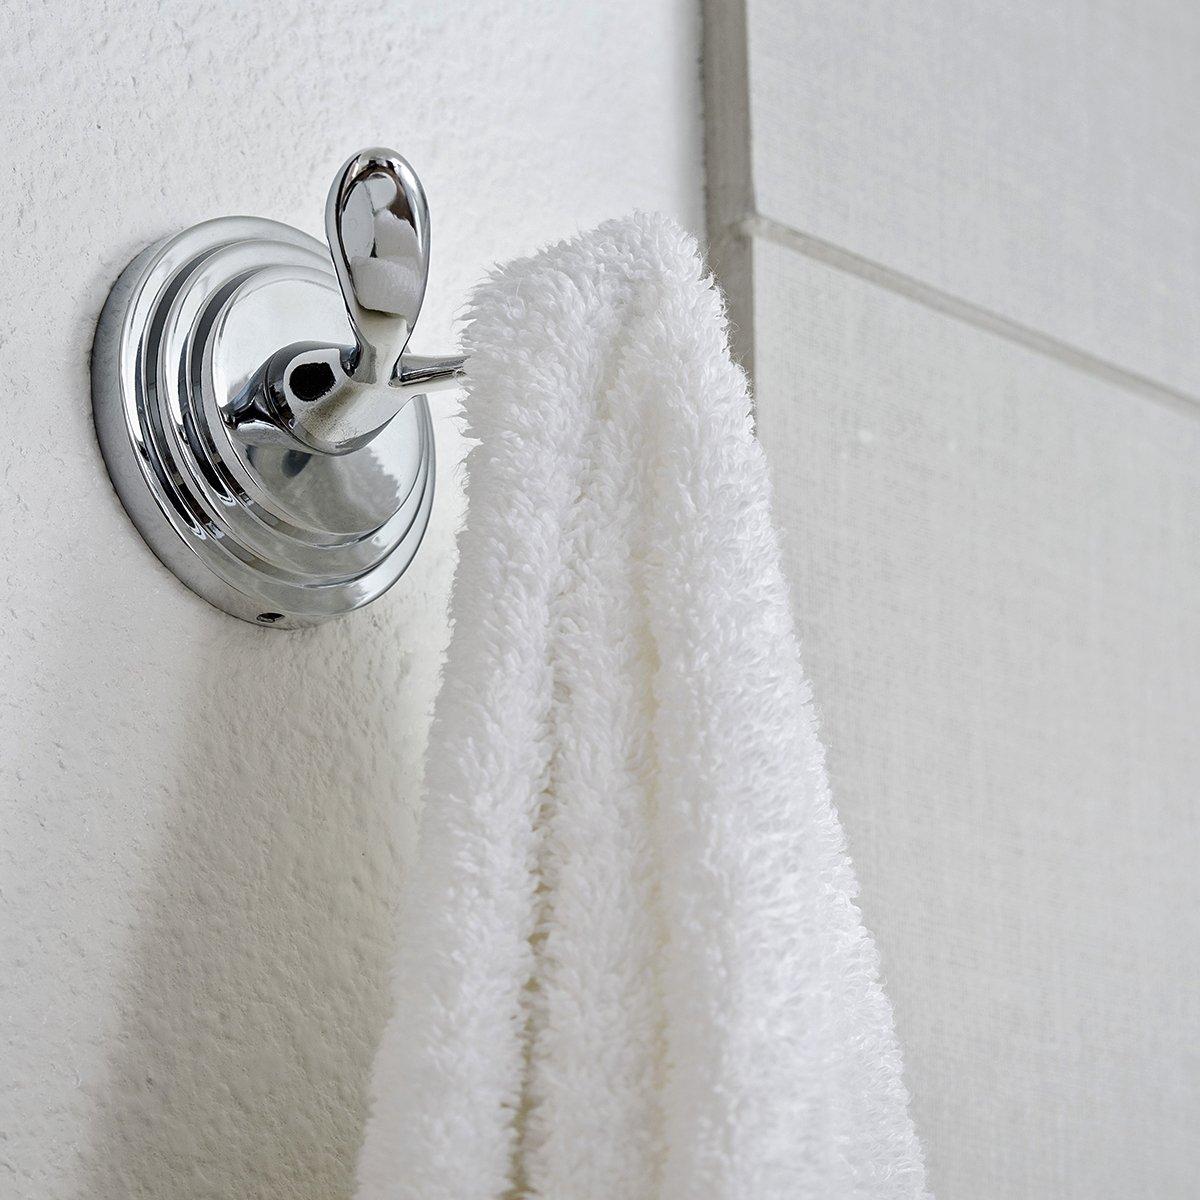 Speakman SA-1405 Refresh Bathroom Paper Holder Polished Chrome